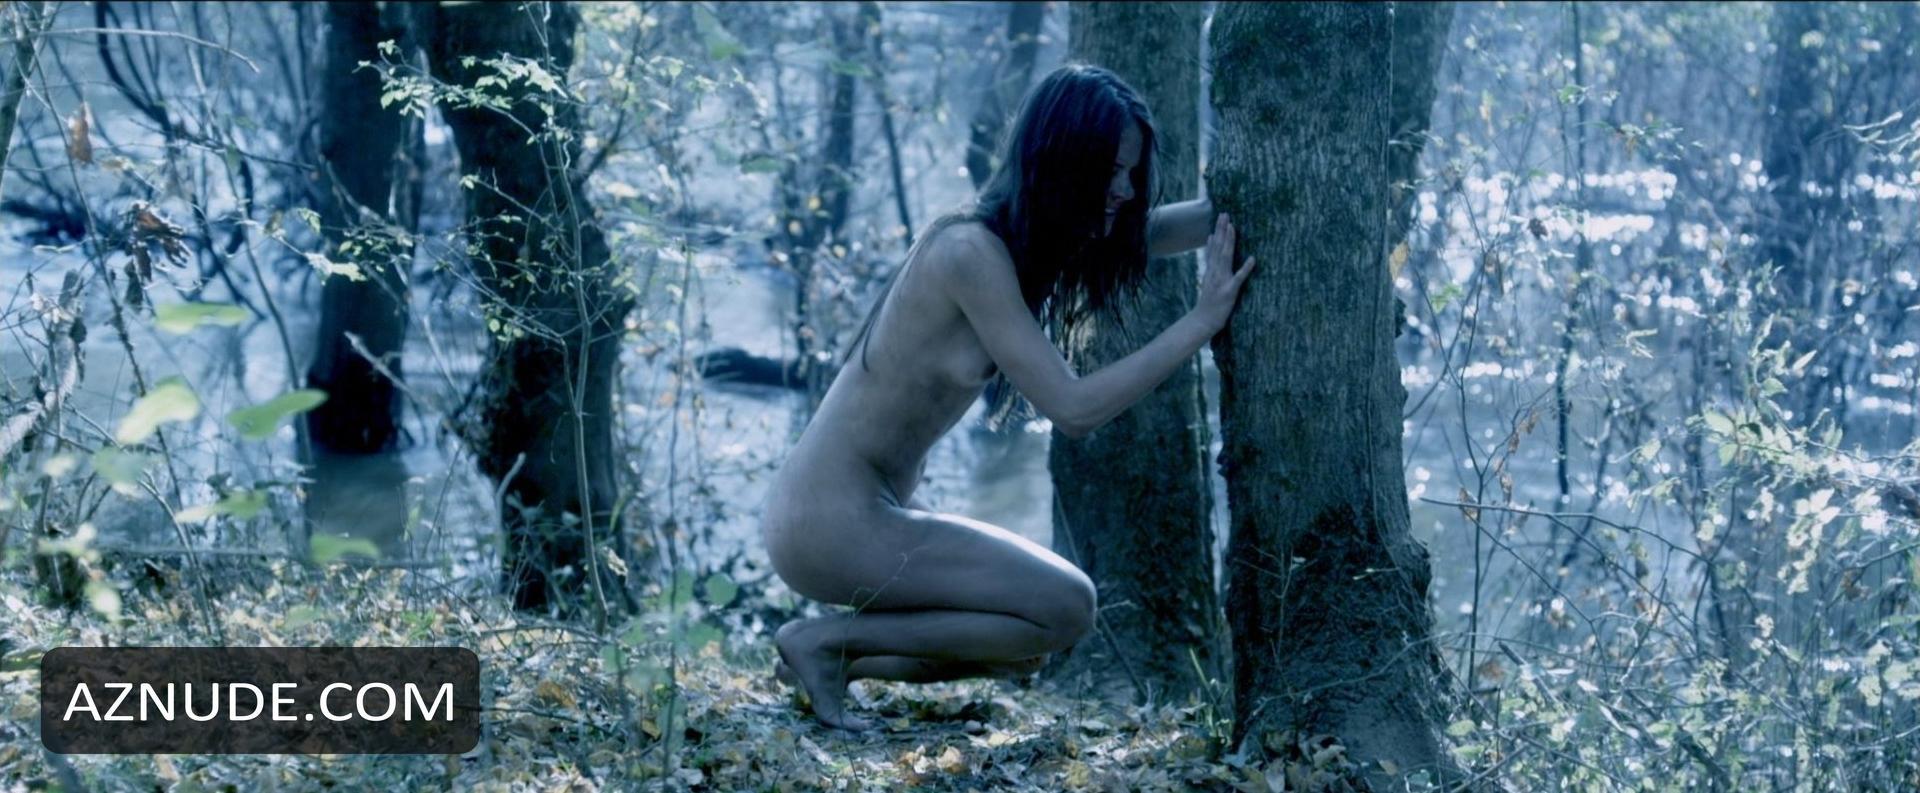 artemis german babe nude